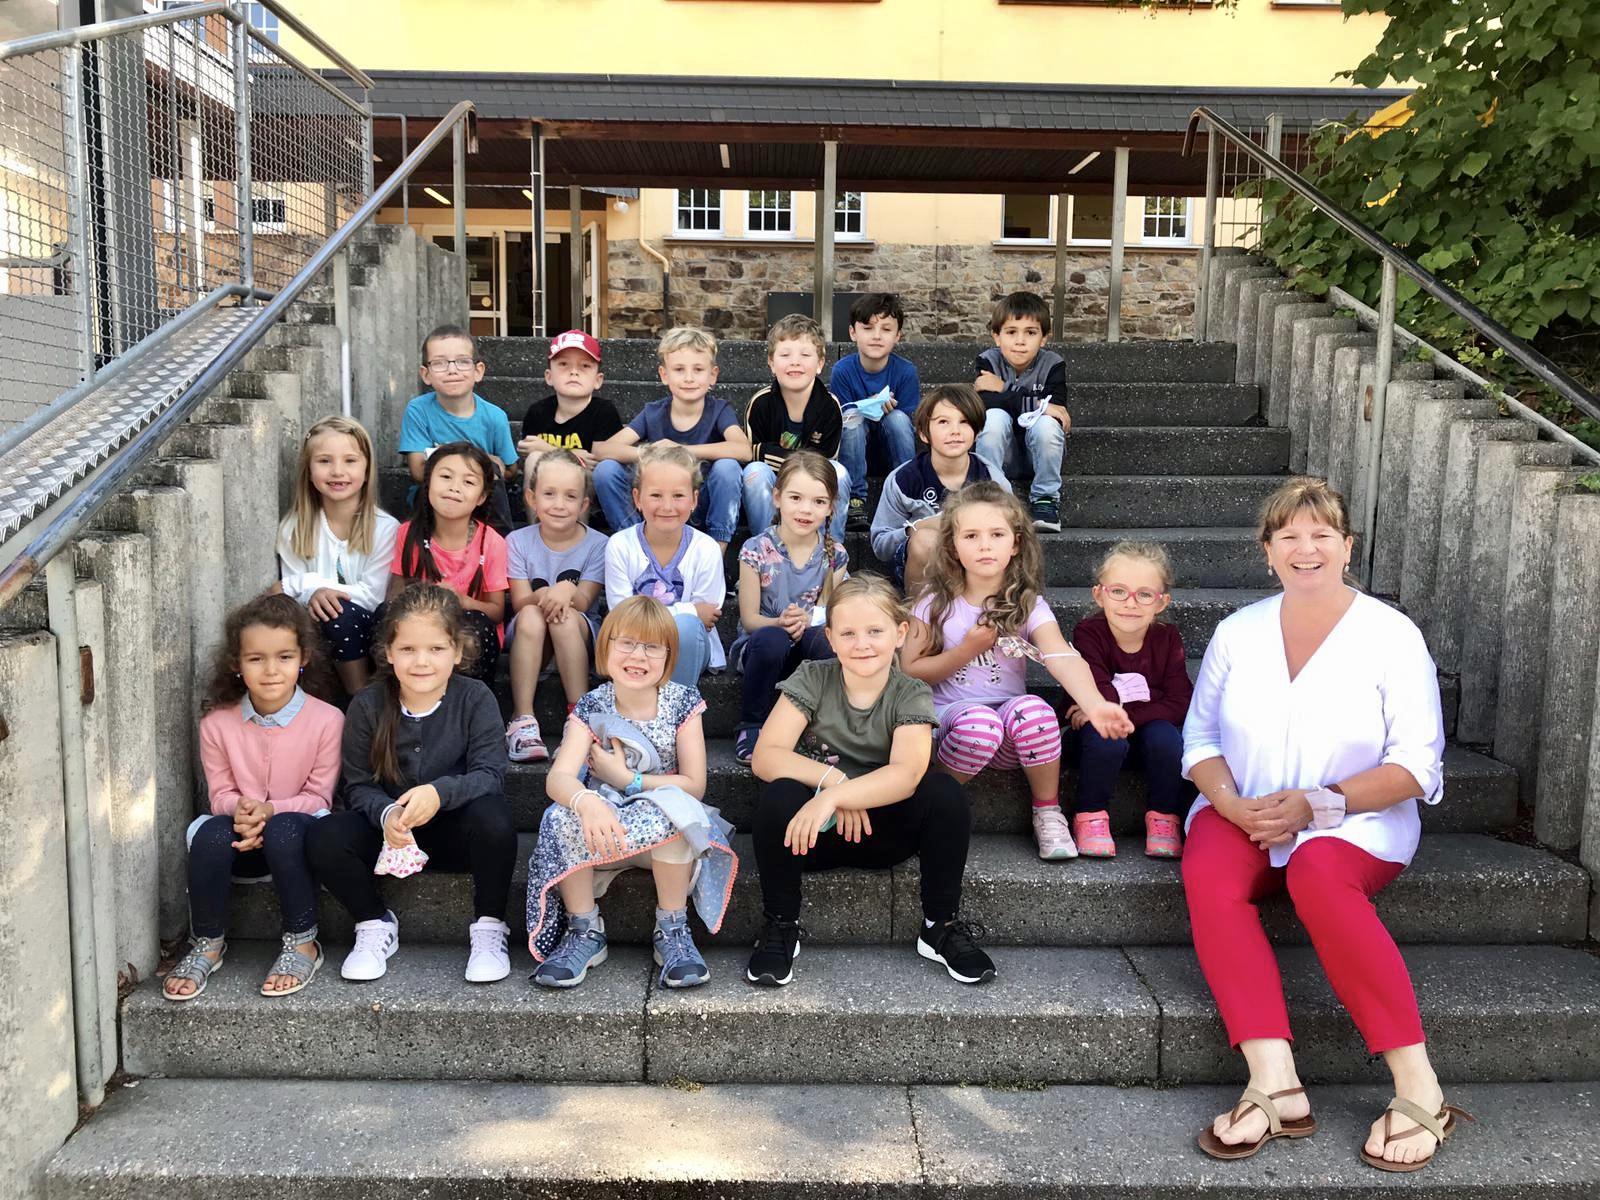 Klasse 1c mit Klassenlehrerin Frau Bechtold